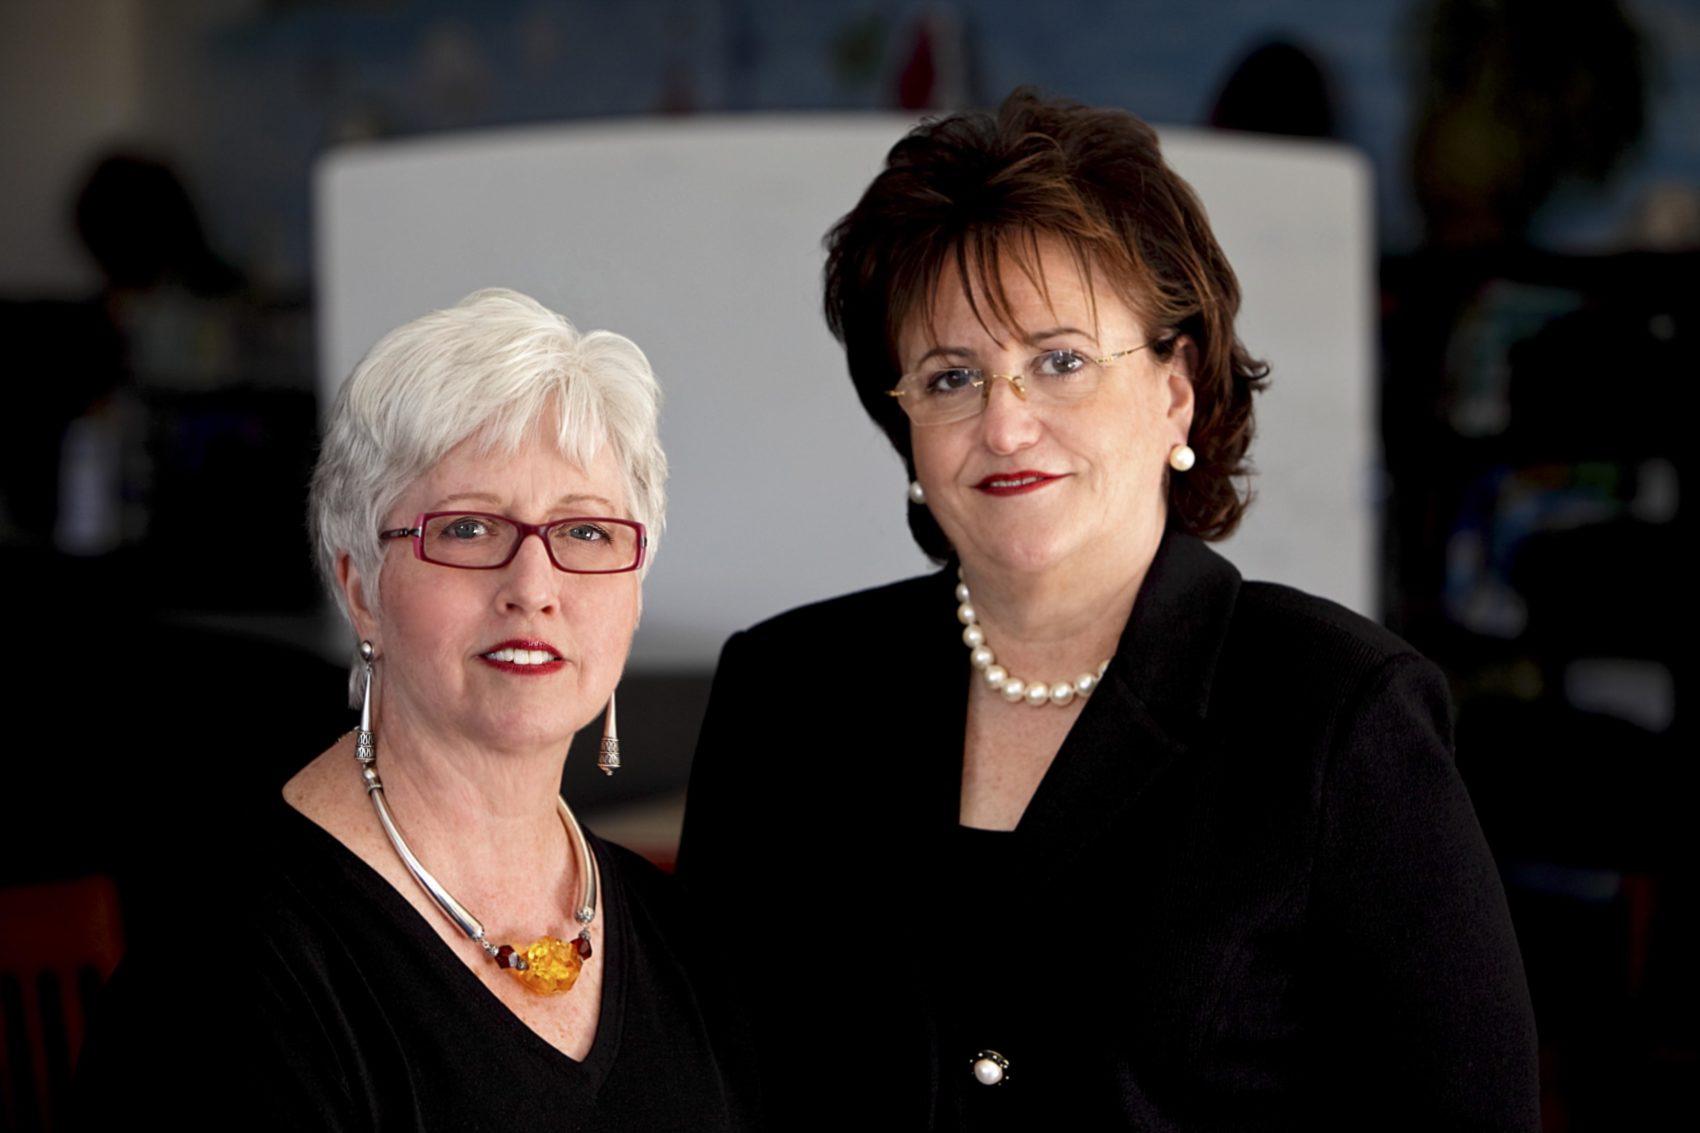 Professional portrait of two women